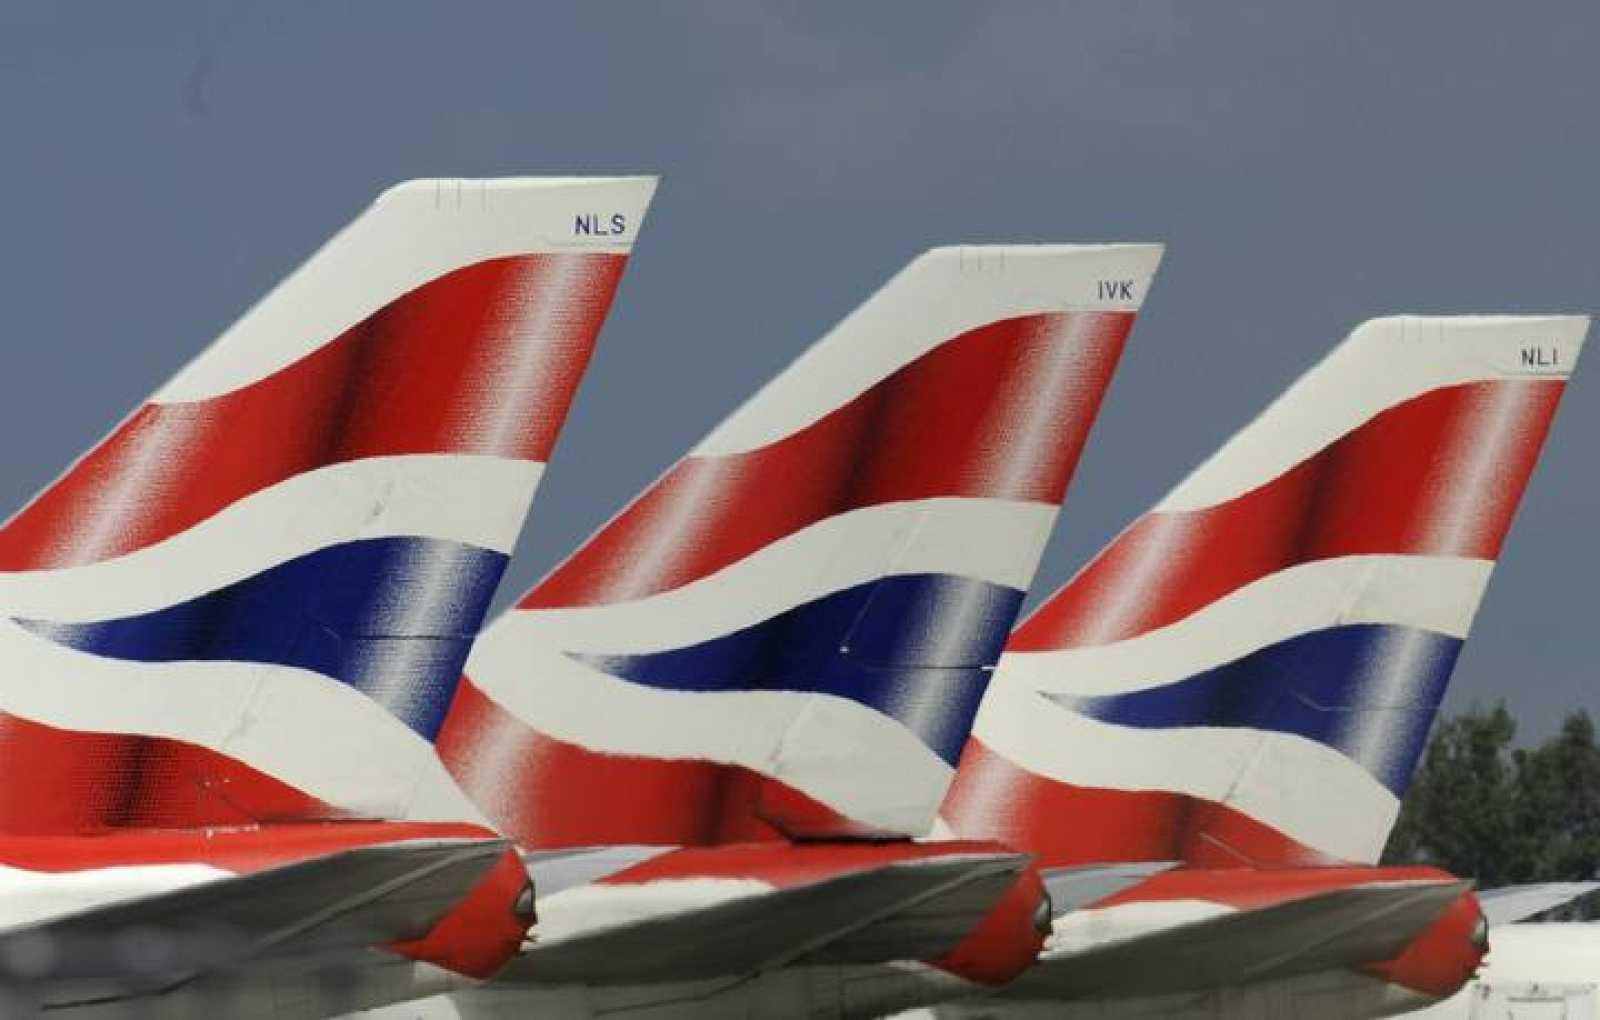 British Airways aircraft tailfins are seen at Heathrow Airport in west London